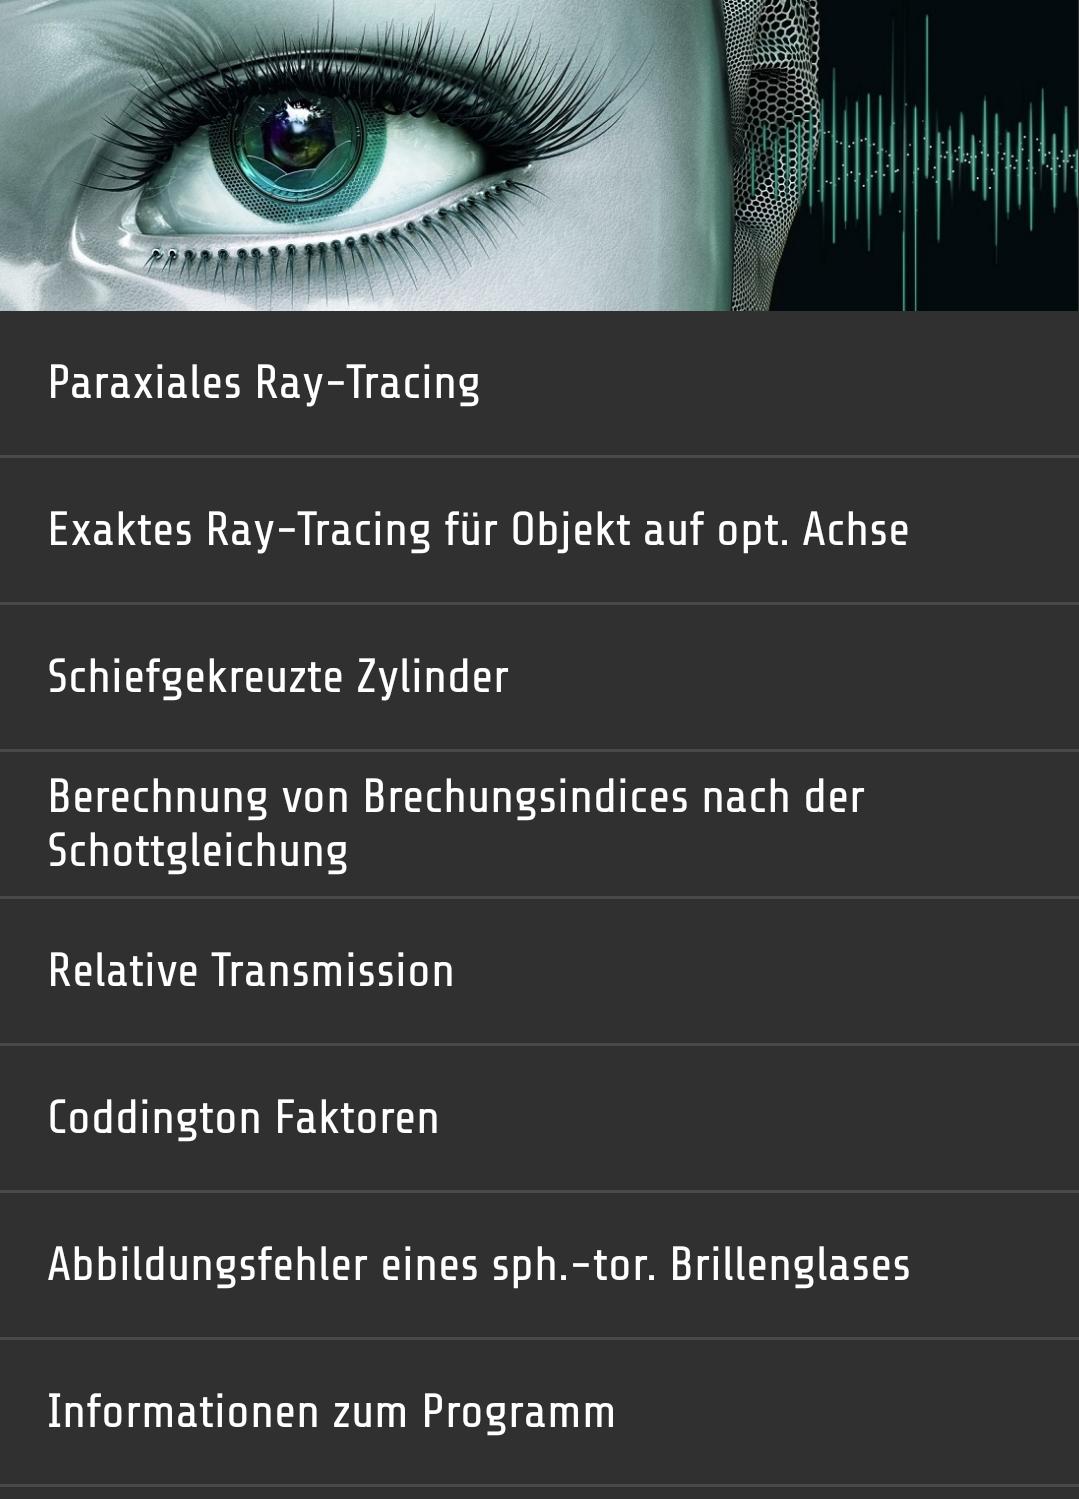 fastlane/metadata/android/en-US/phoneScreenshots/exa_1.png